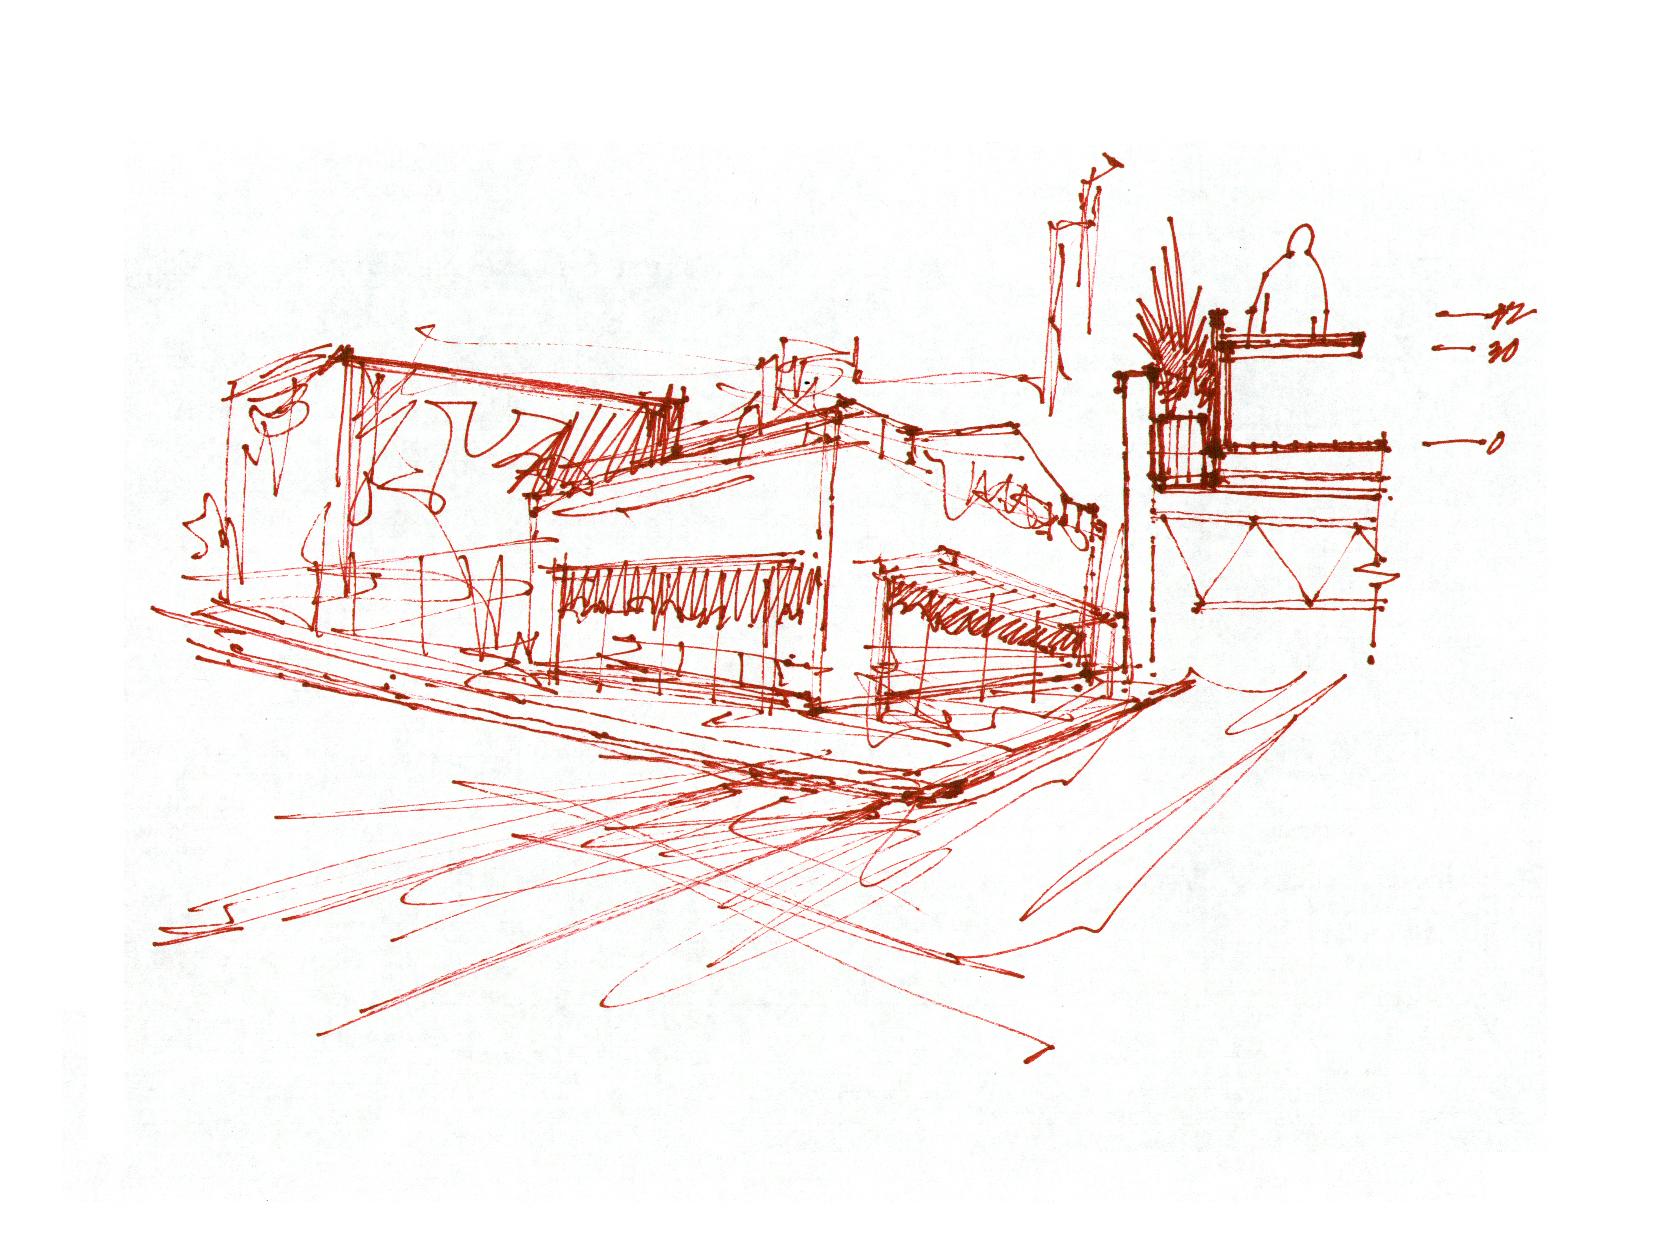 bolzano_sketch-1.jpg